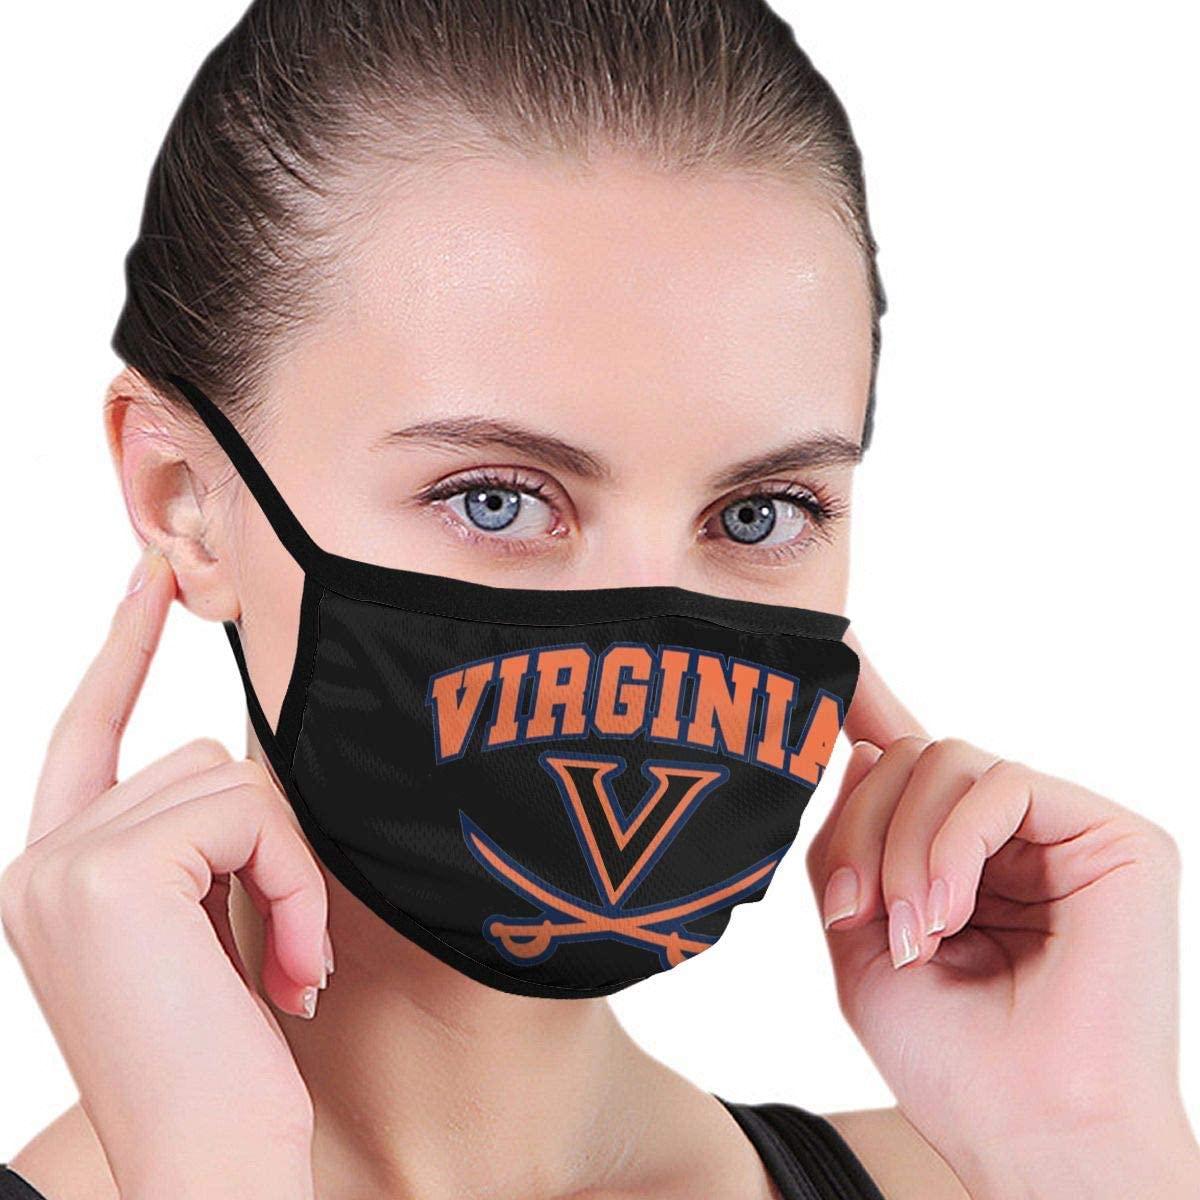 Uva Cavalier Outdoor Dy Decorative Face Protection Face Cover Bandana Gaiter Balaclava Scarf Headwear